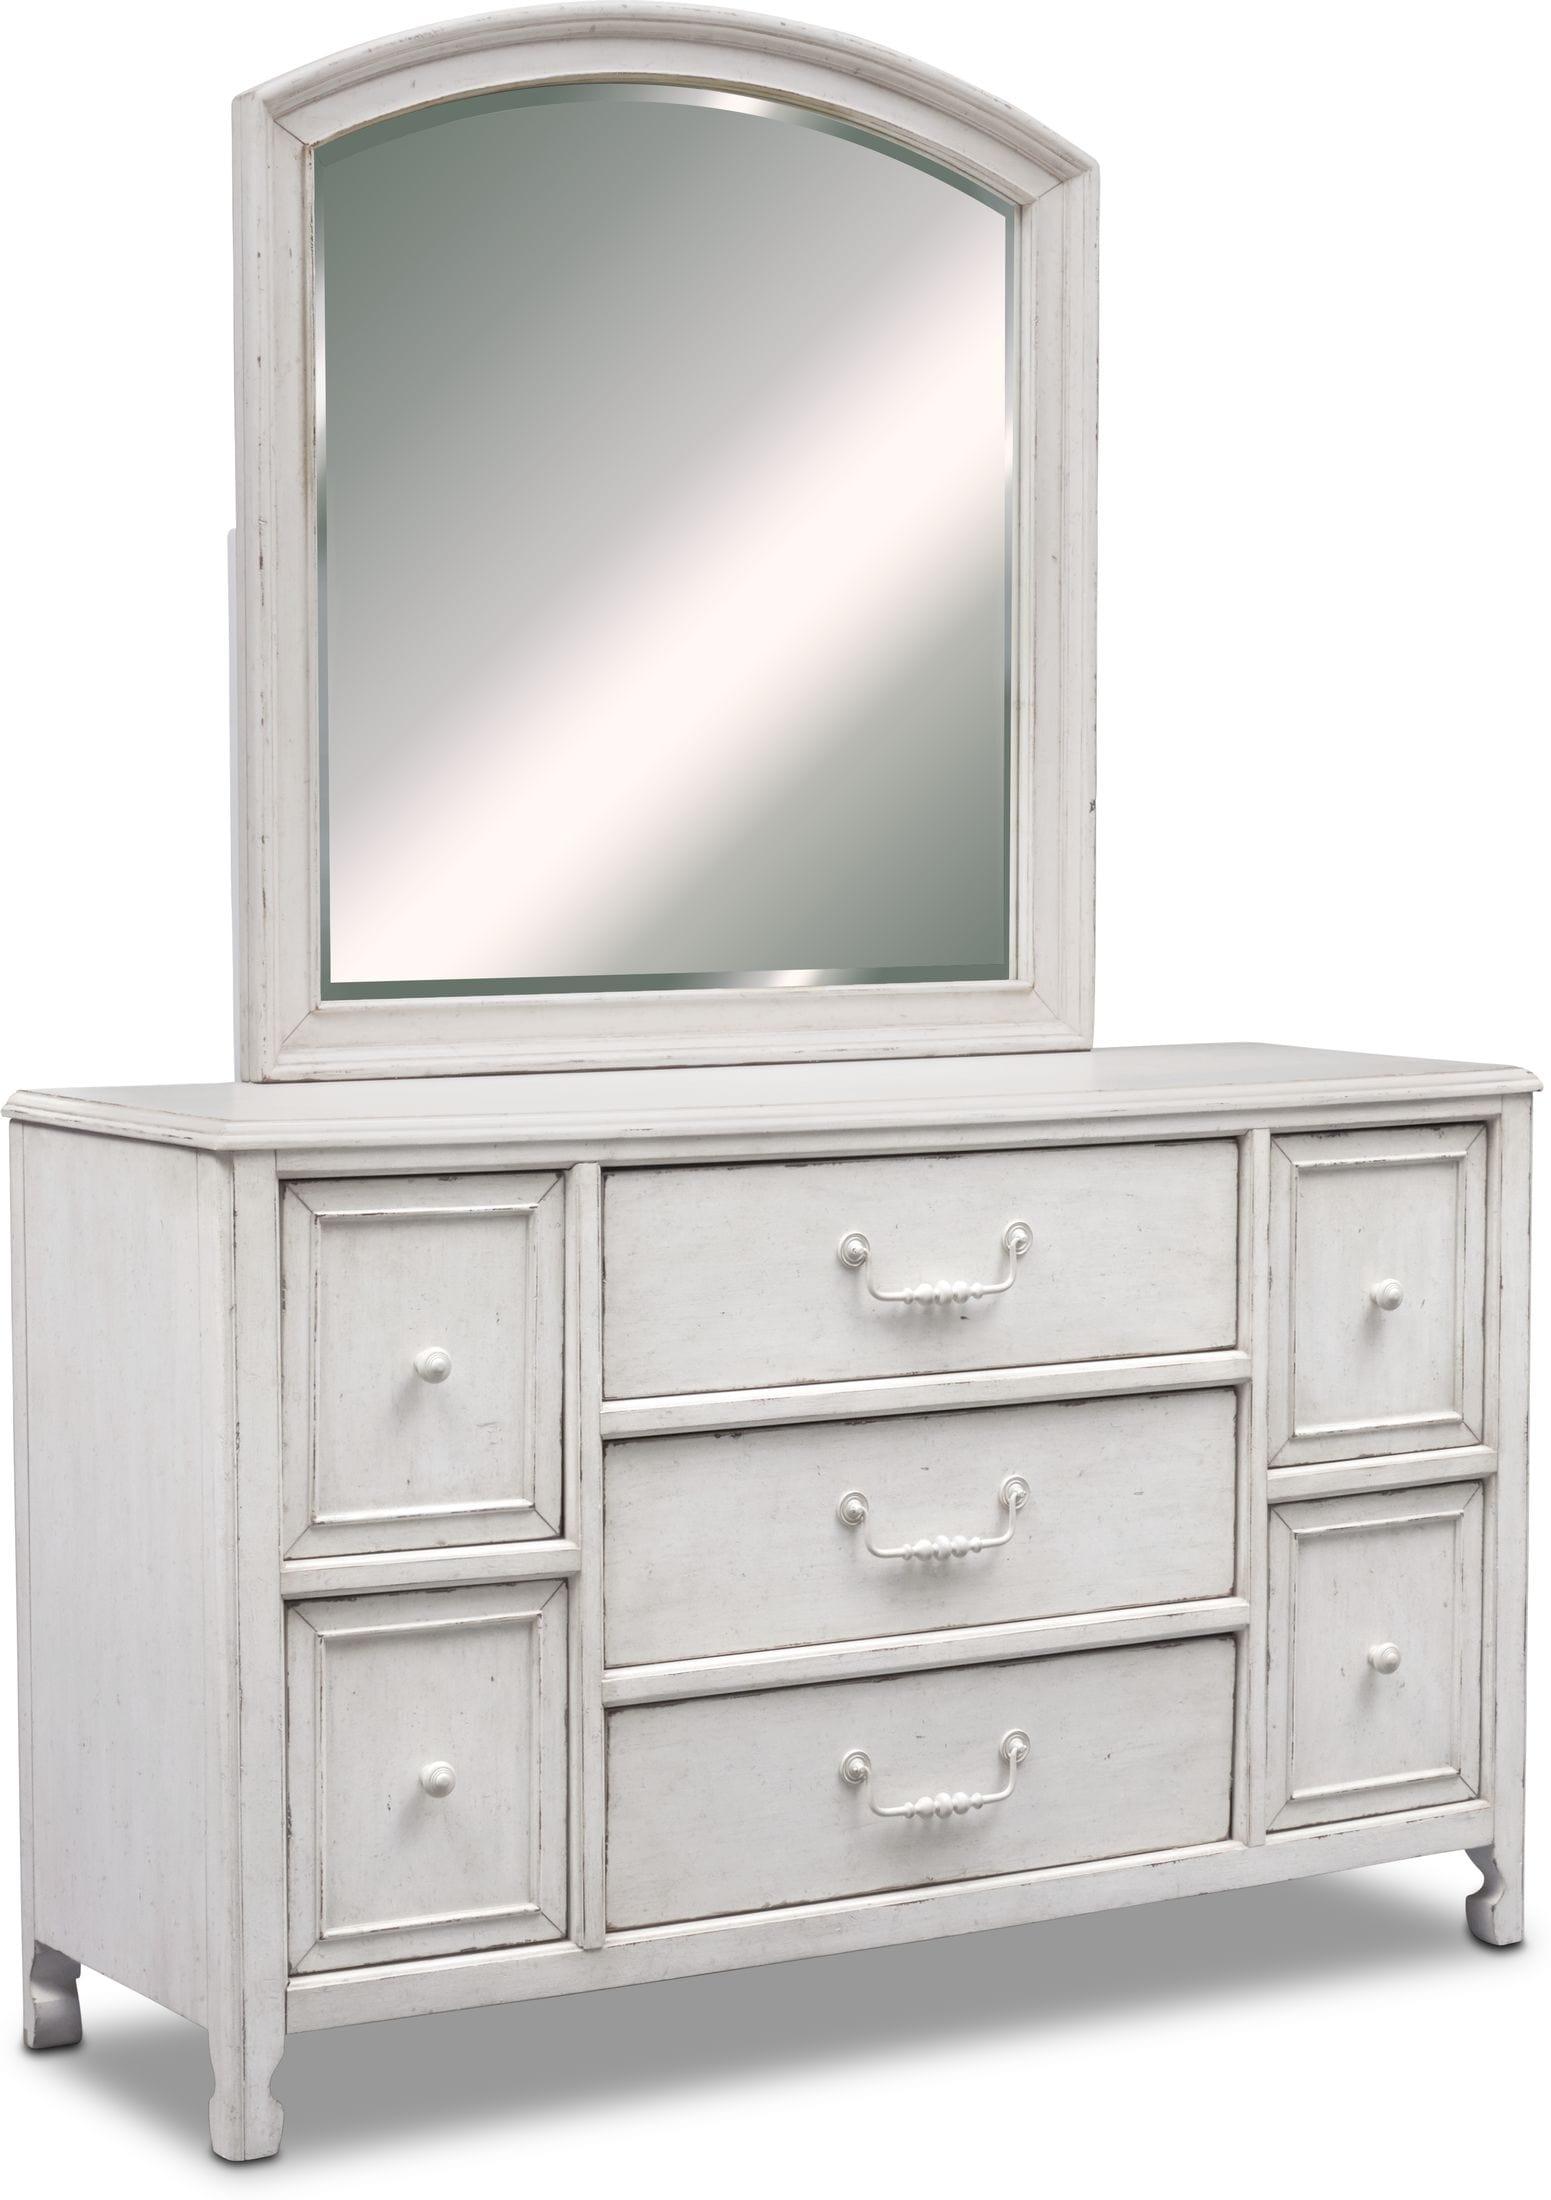 Bedroom Furniture - Florence Dresser and Mirror